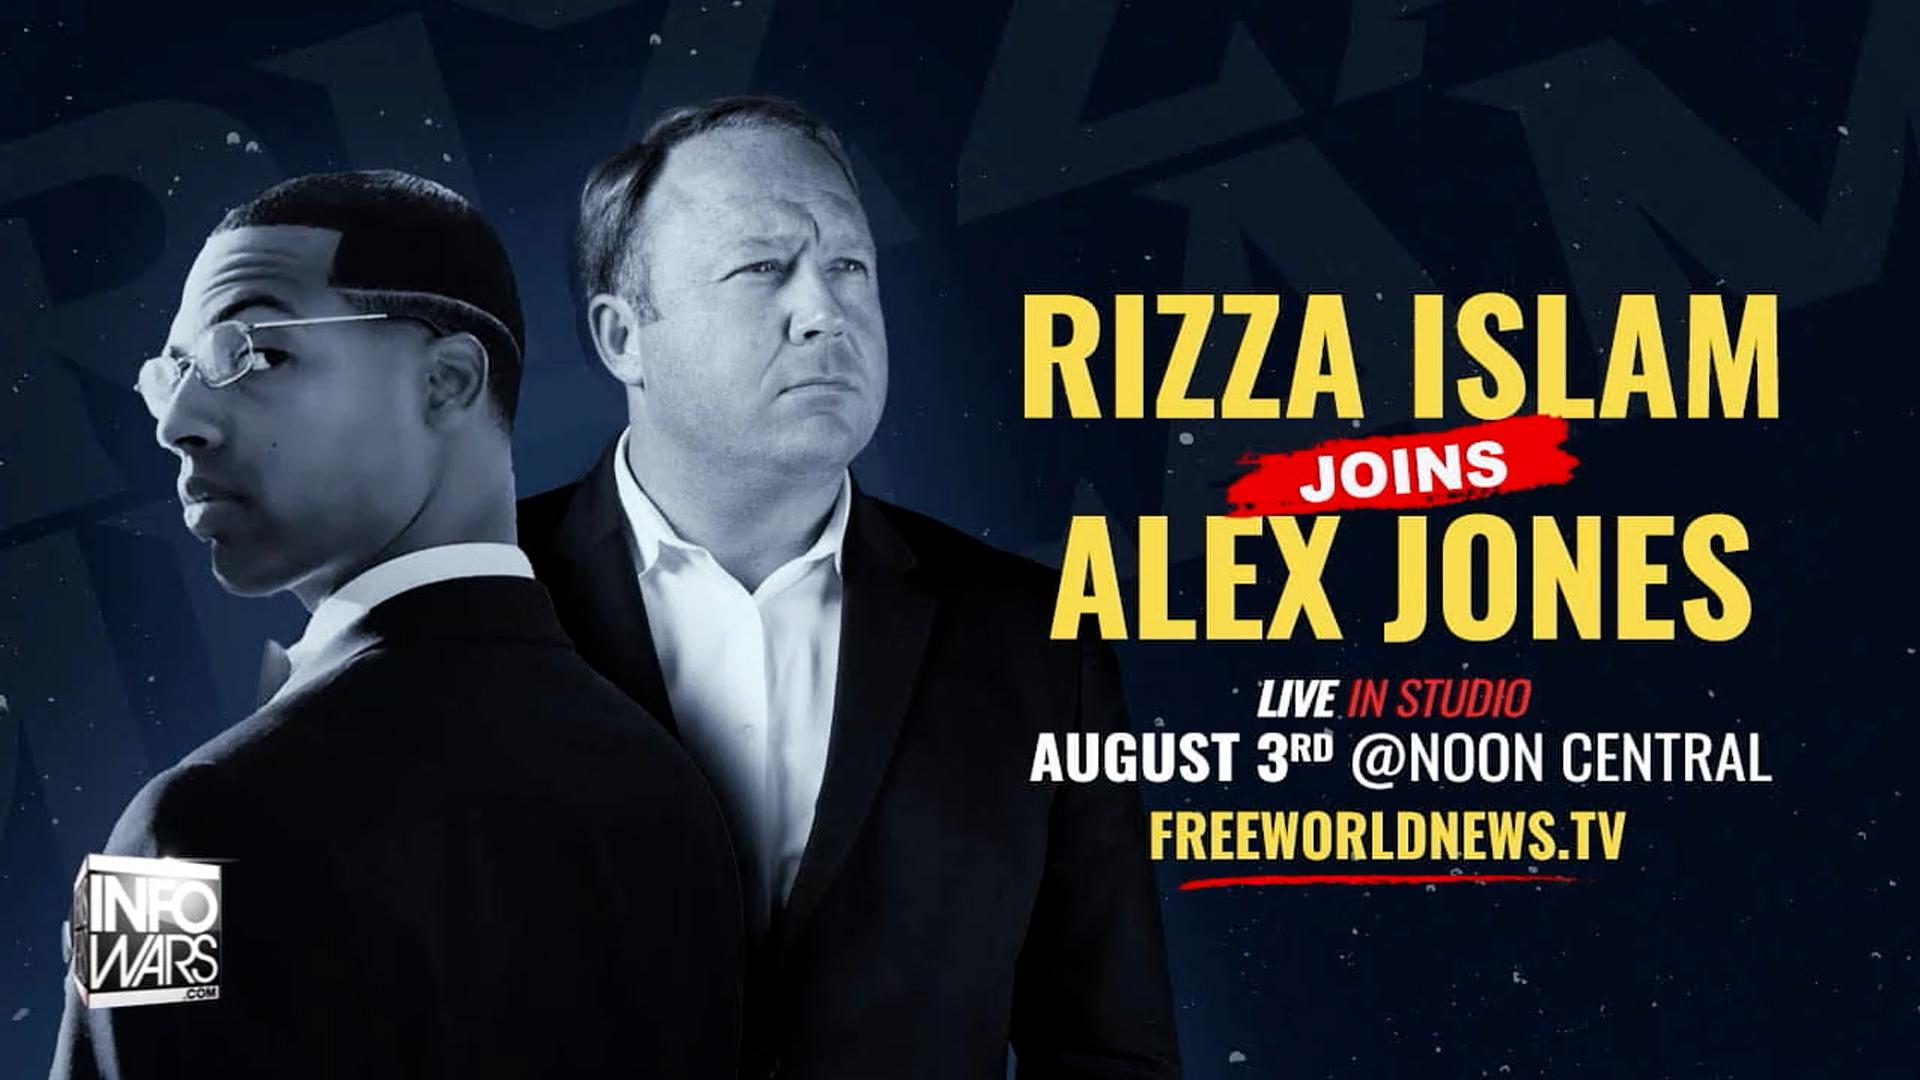 Rizza Islam On Info Wars With Alex Jones